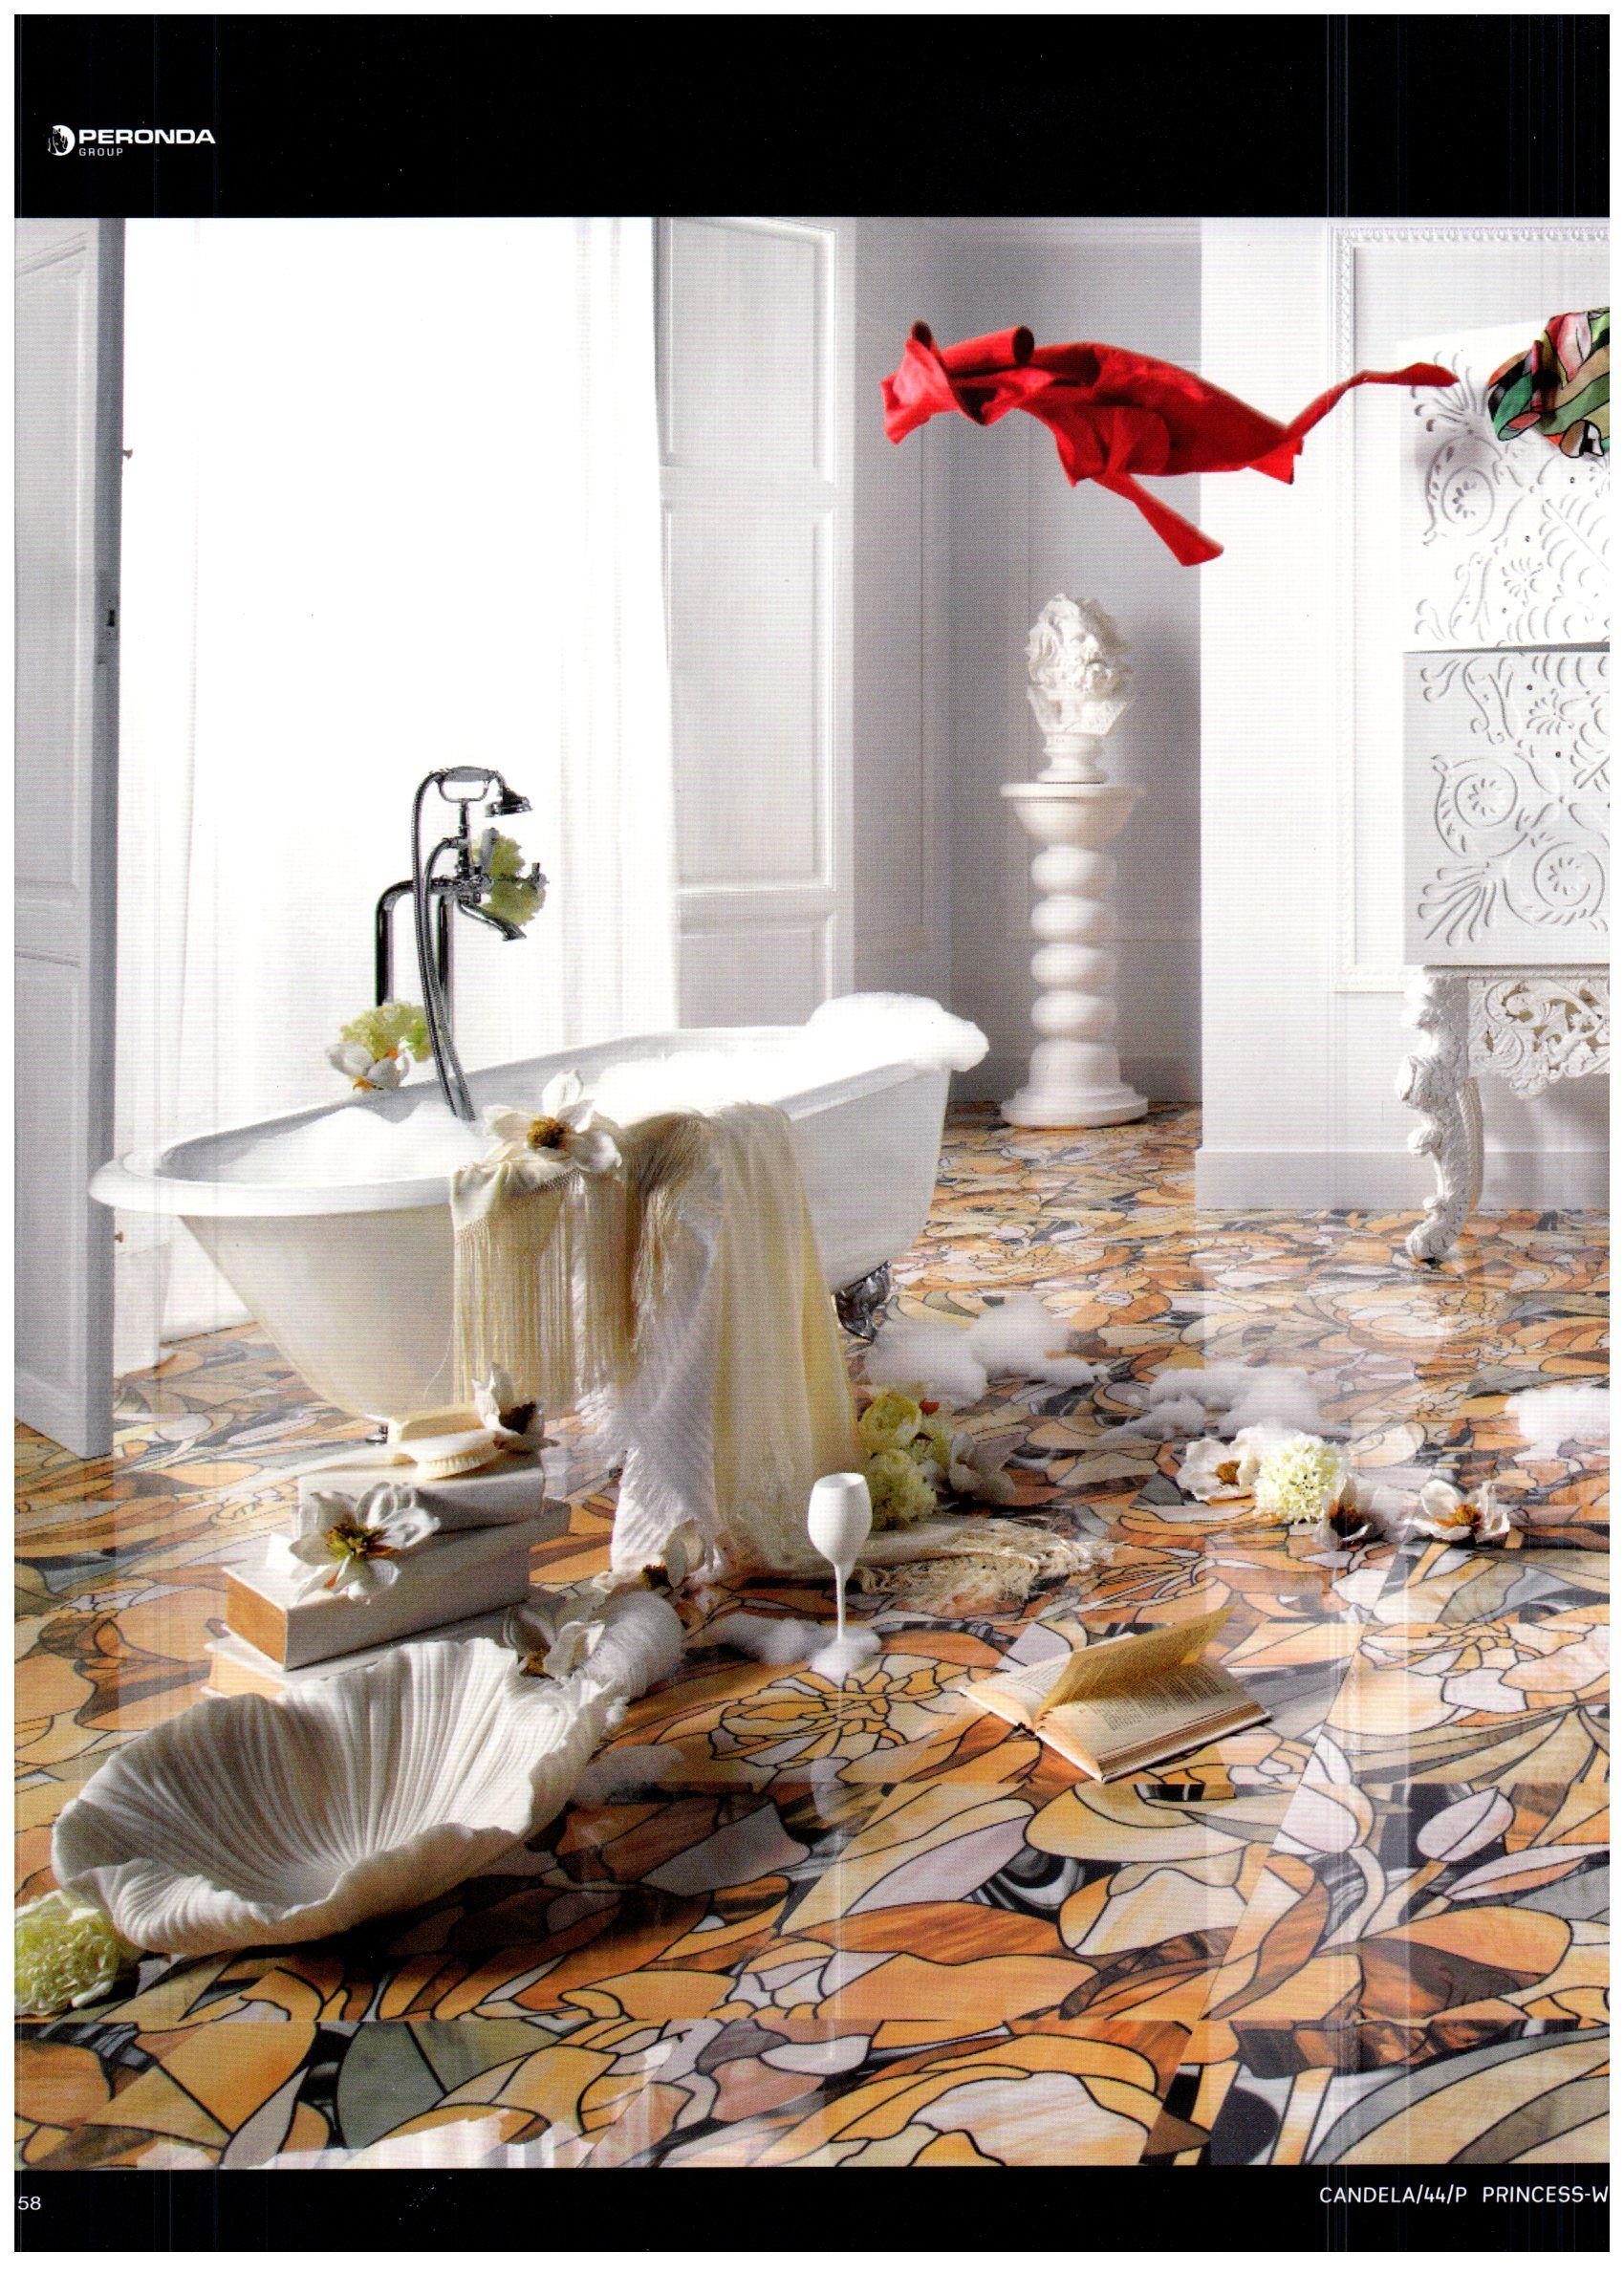 deco kitchen or bathroom orchidéeréf 1858 faience Stickers wall tiles